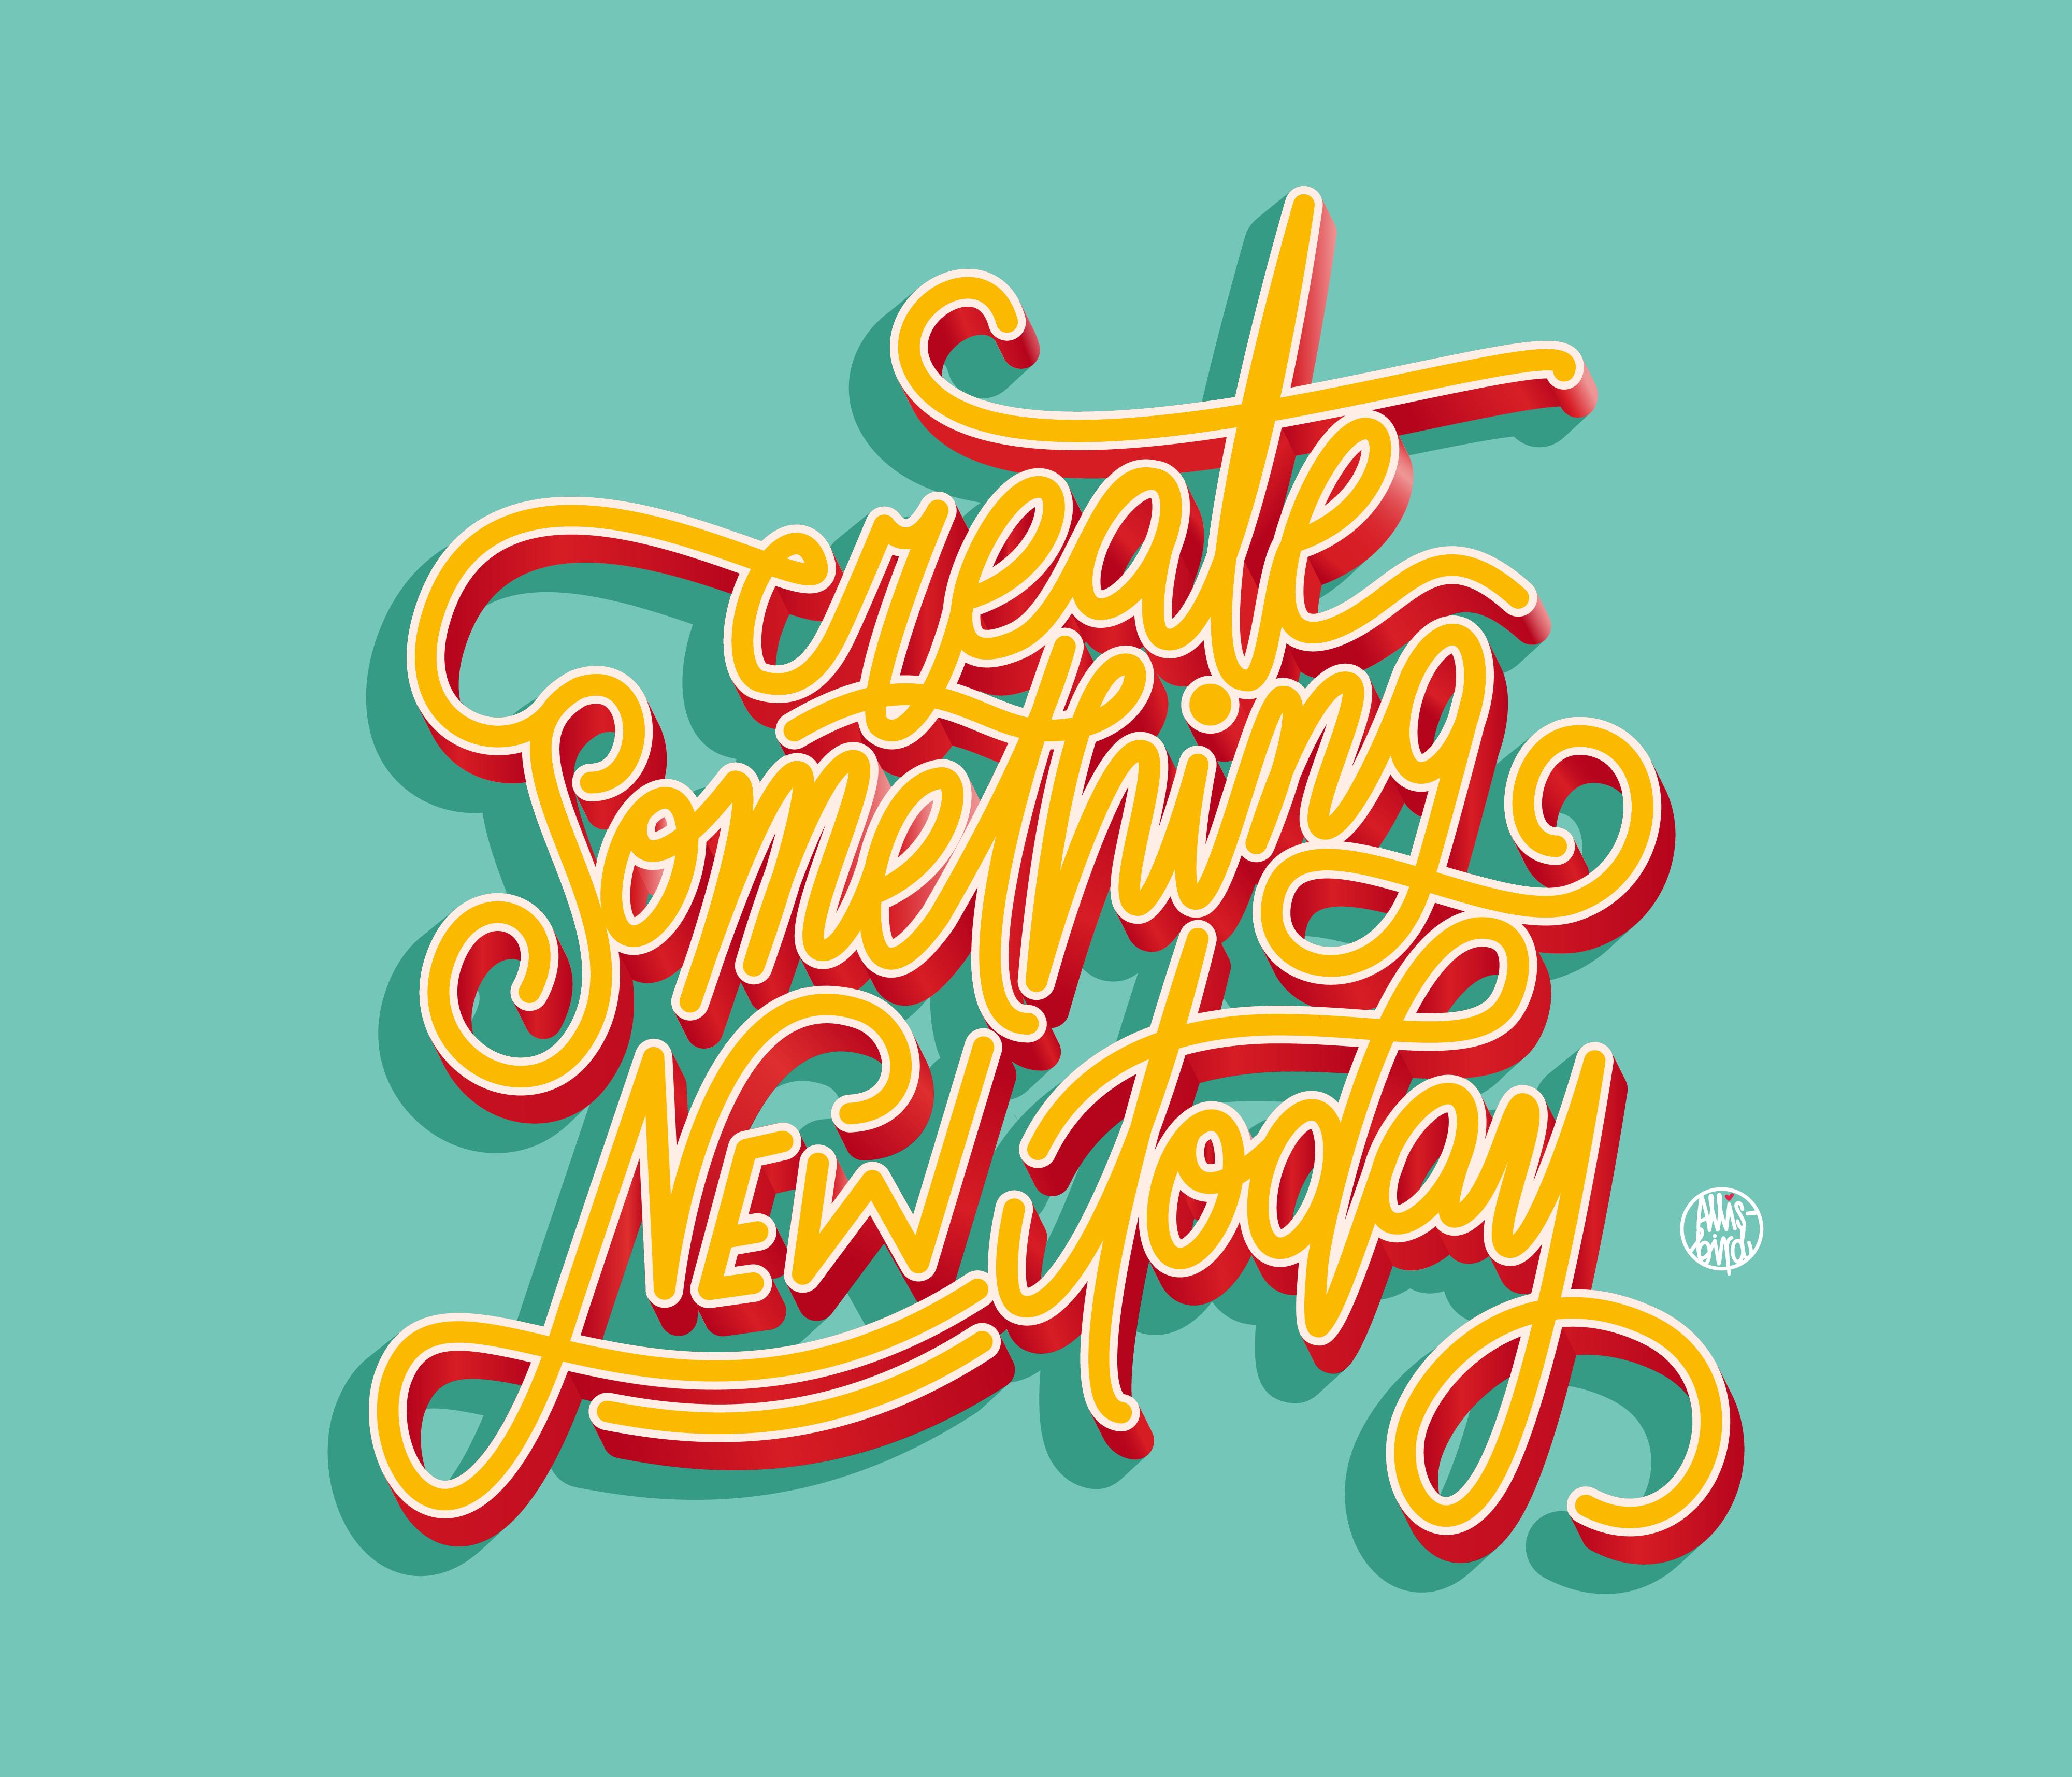 fontdesign-typography-design_illustration_01_06